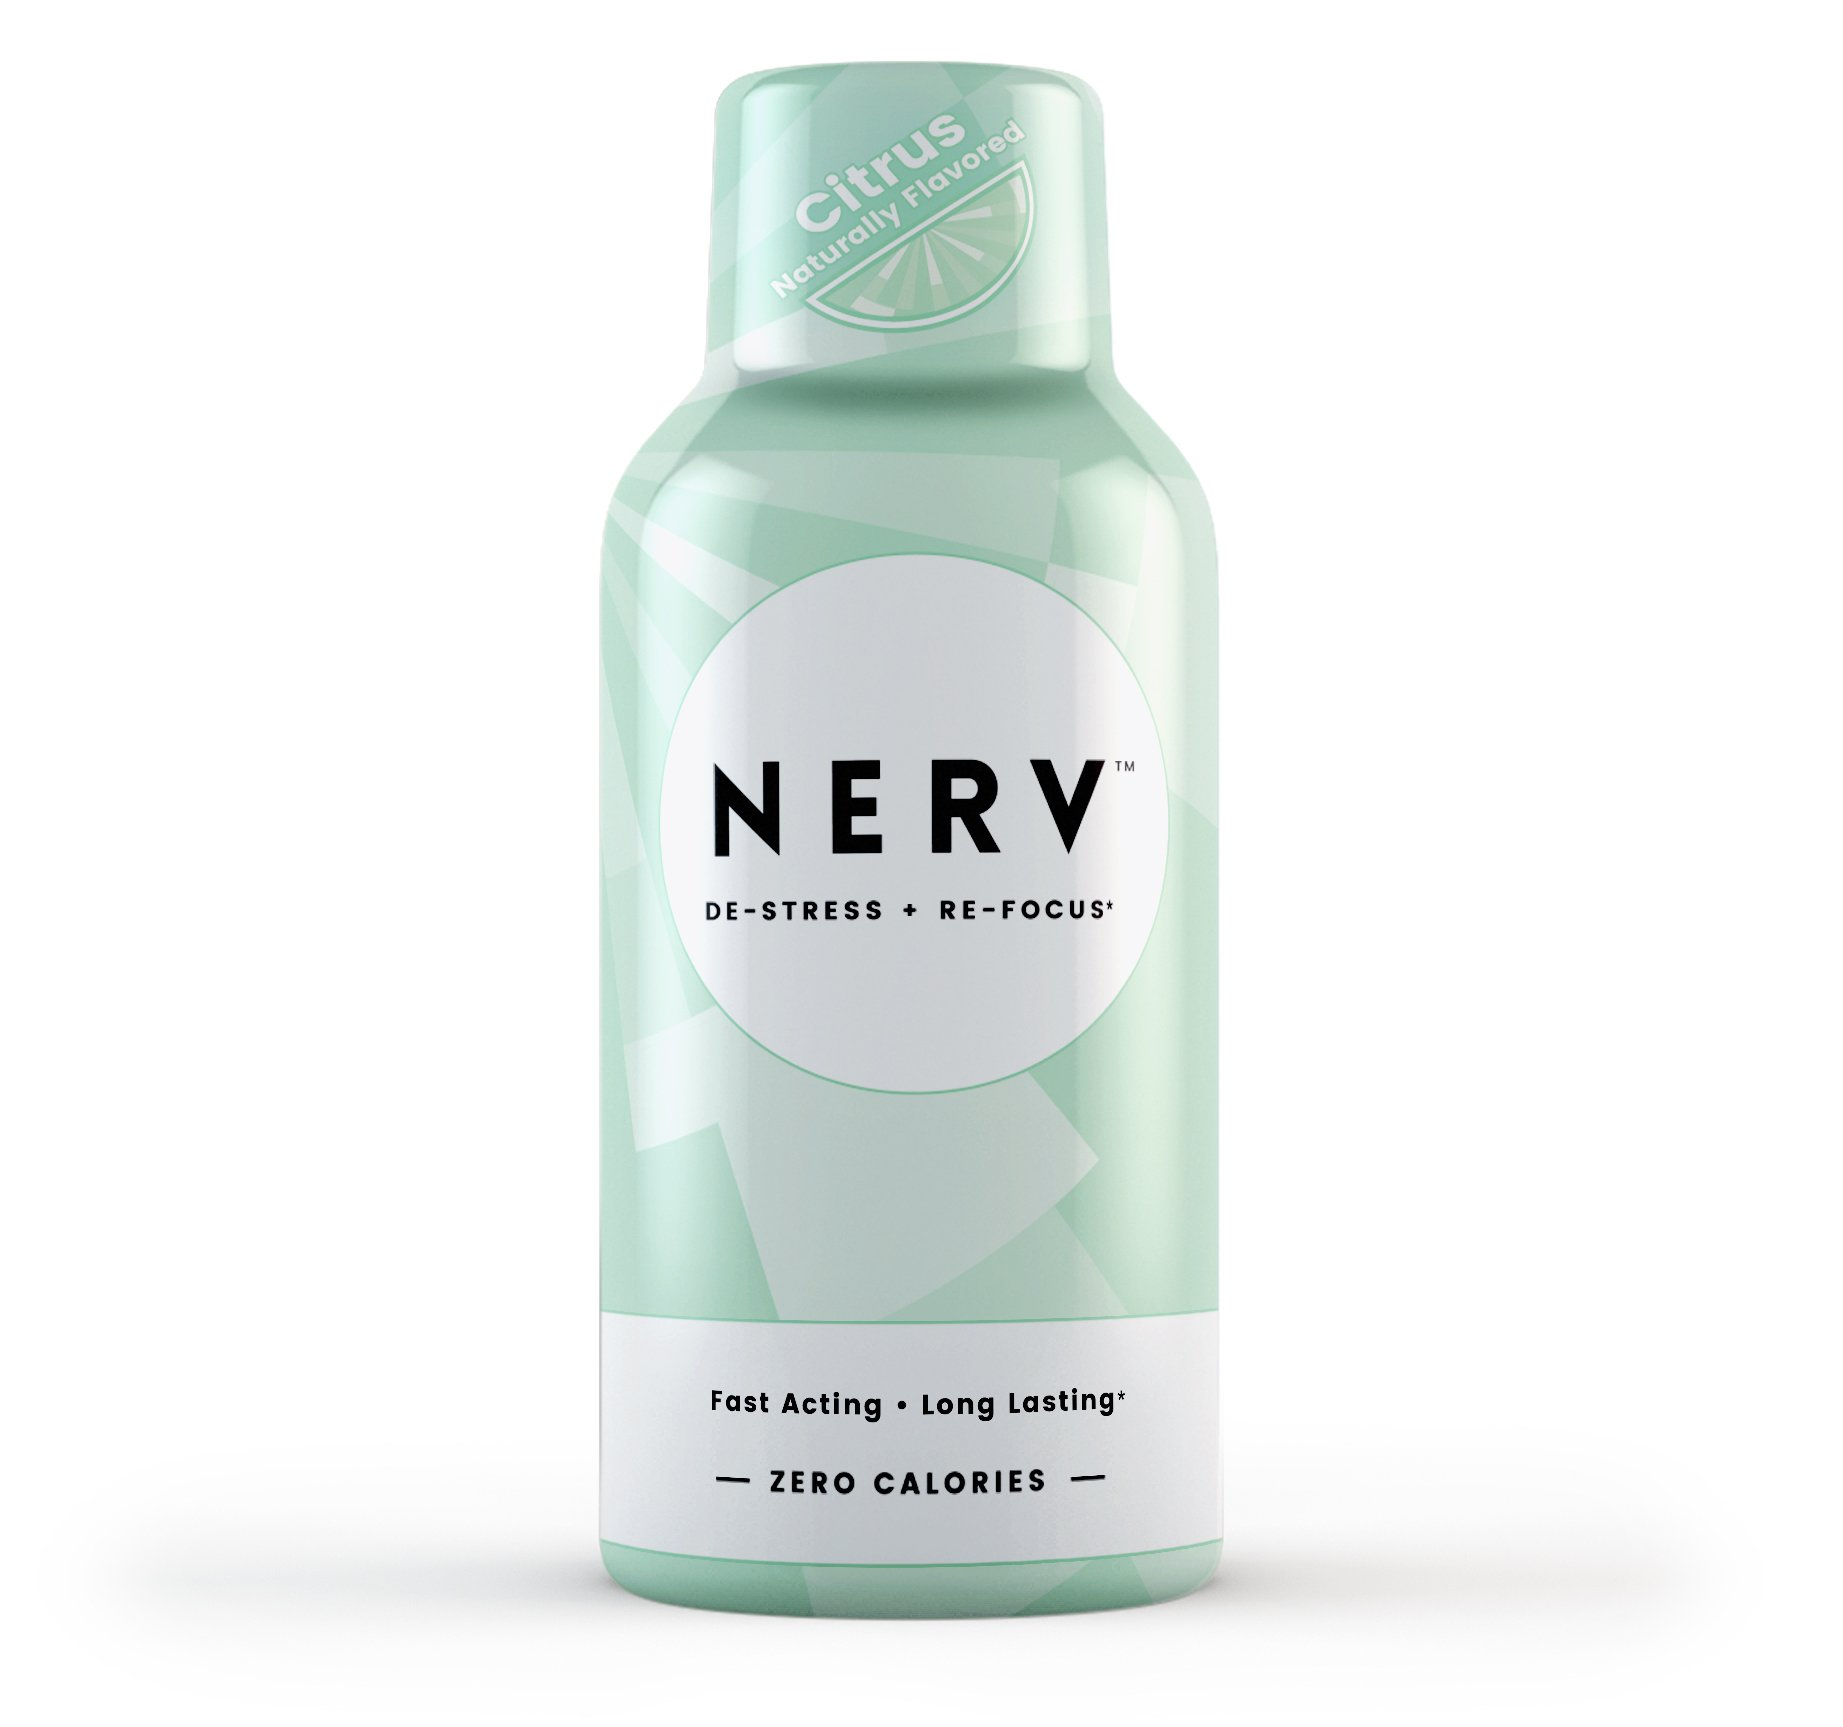 Nerv Drink (6-Pack)- Stress-Less, Enhance Focus, No Crash, 2 Oz Shot, Vitamin B, L-theanine - All Natural Citrus Flavored (Non-GMO, Vegan, Soy-Free) by Nerv